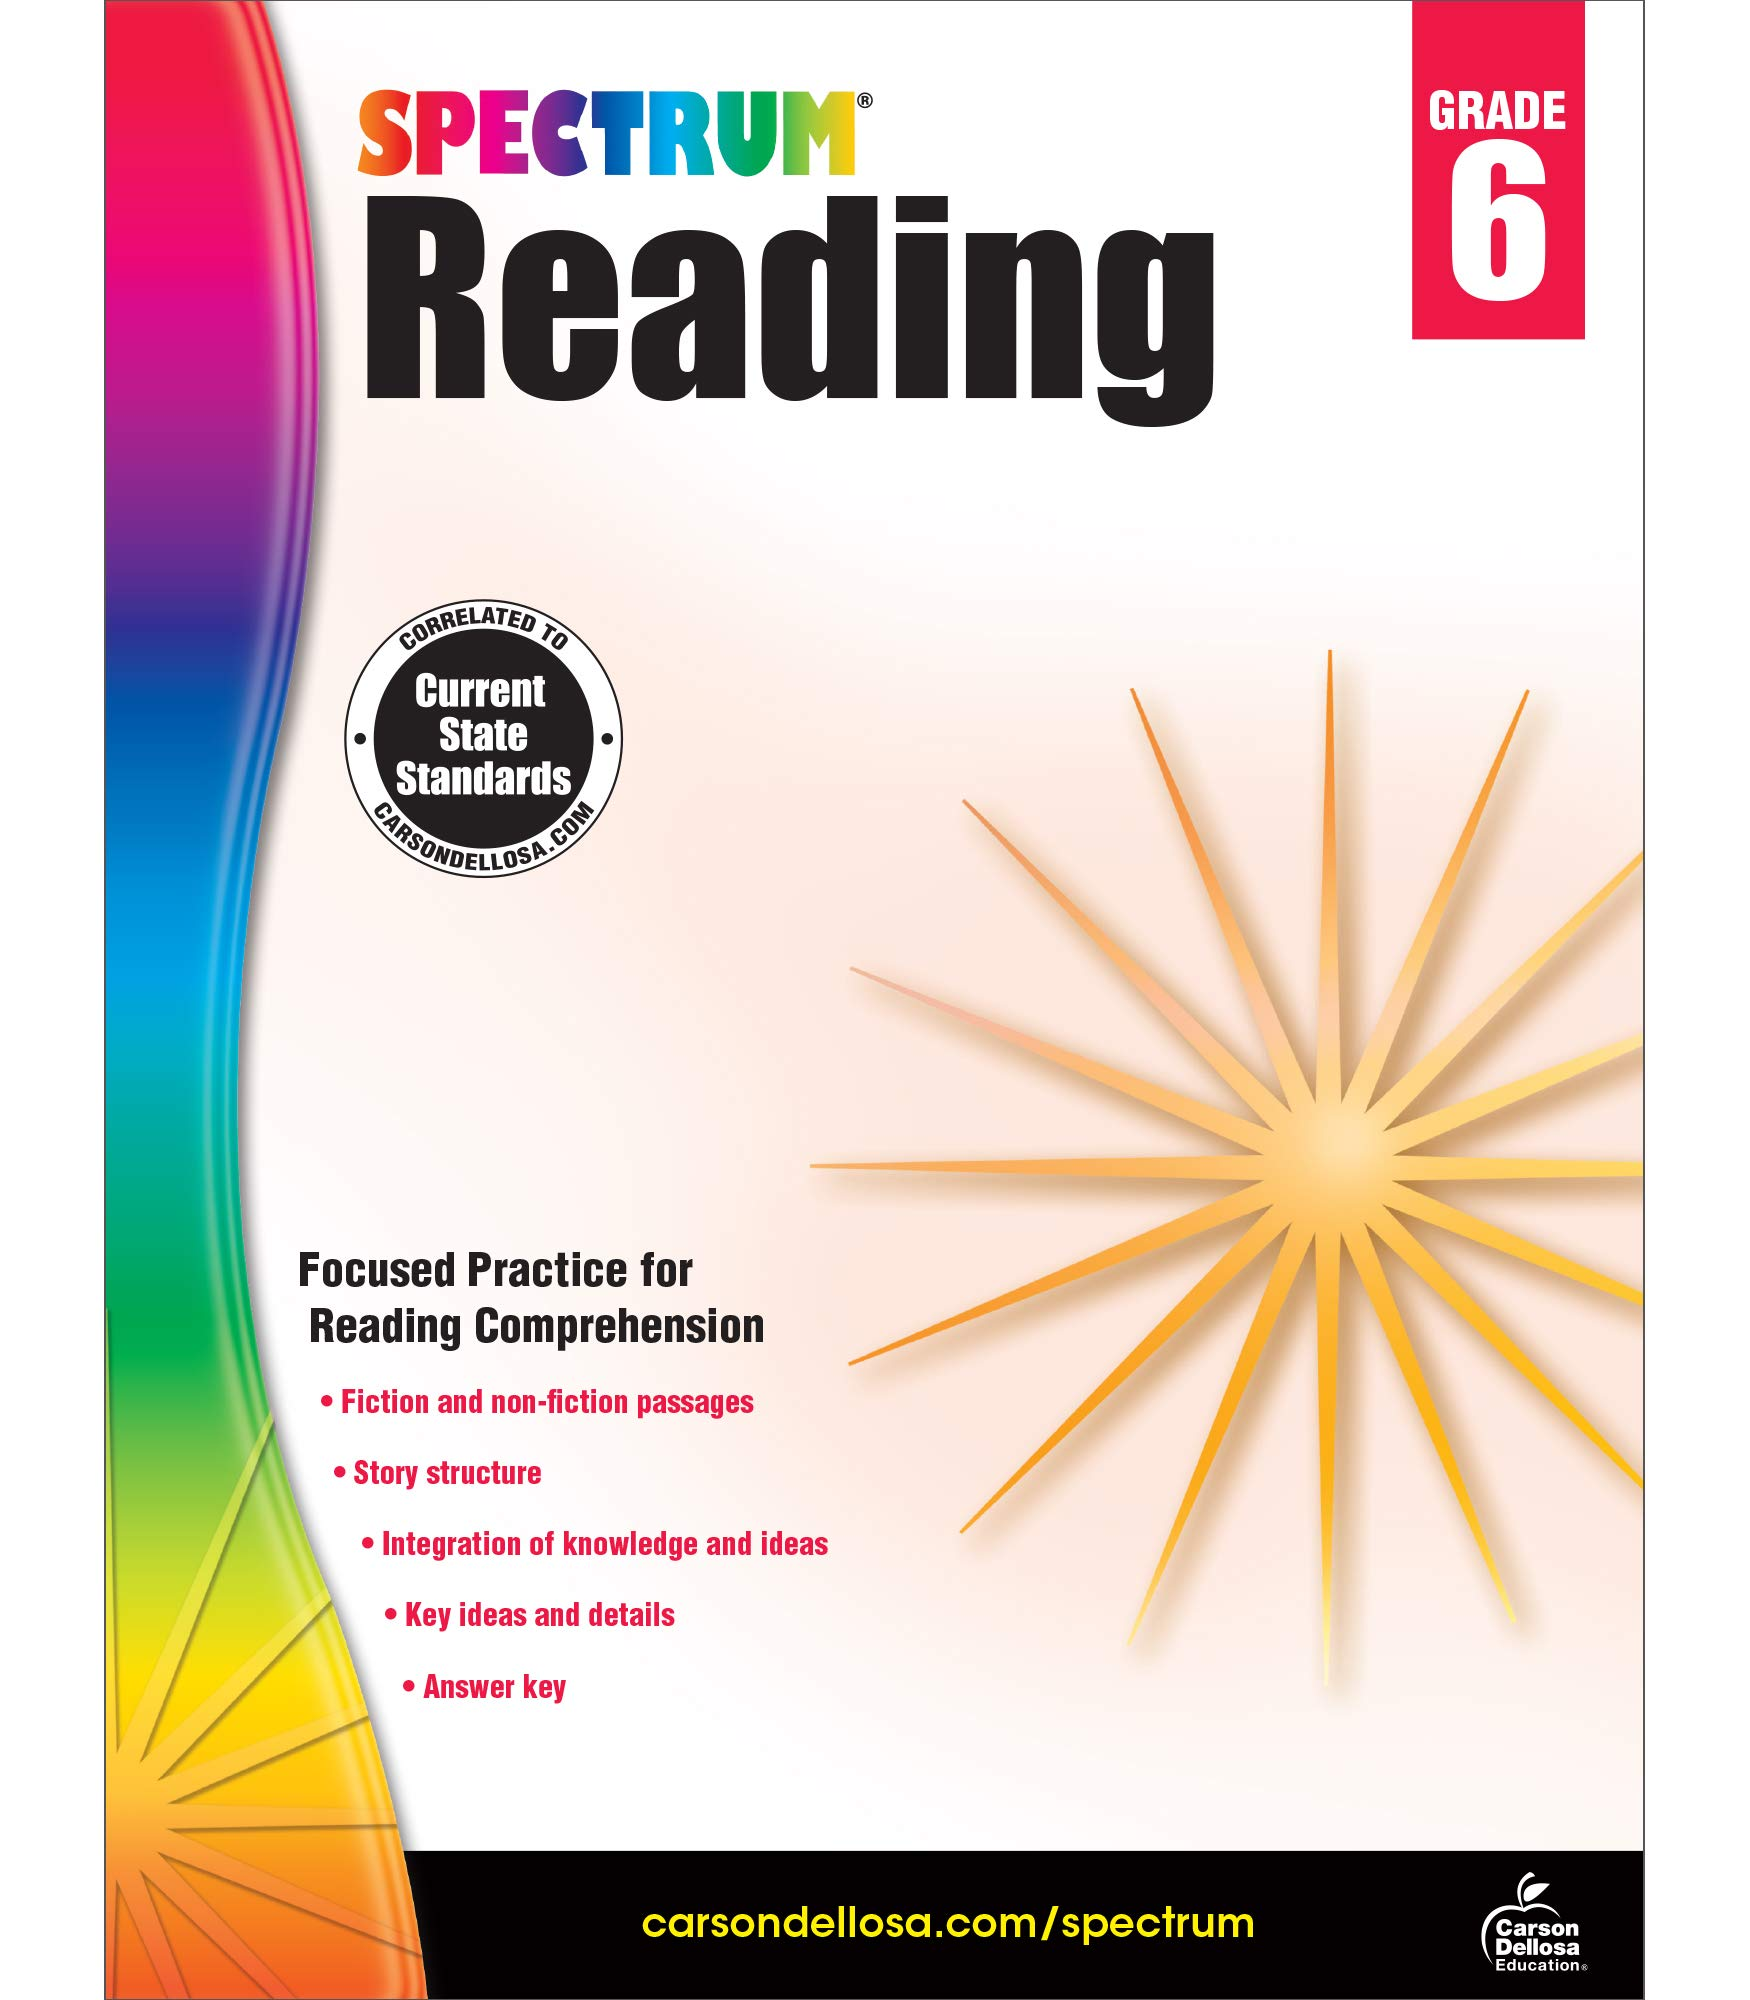 - Spectrum Reading Workbook, Grade 6: Spectrum: 9781483812199: Books